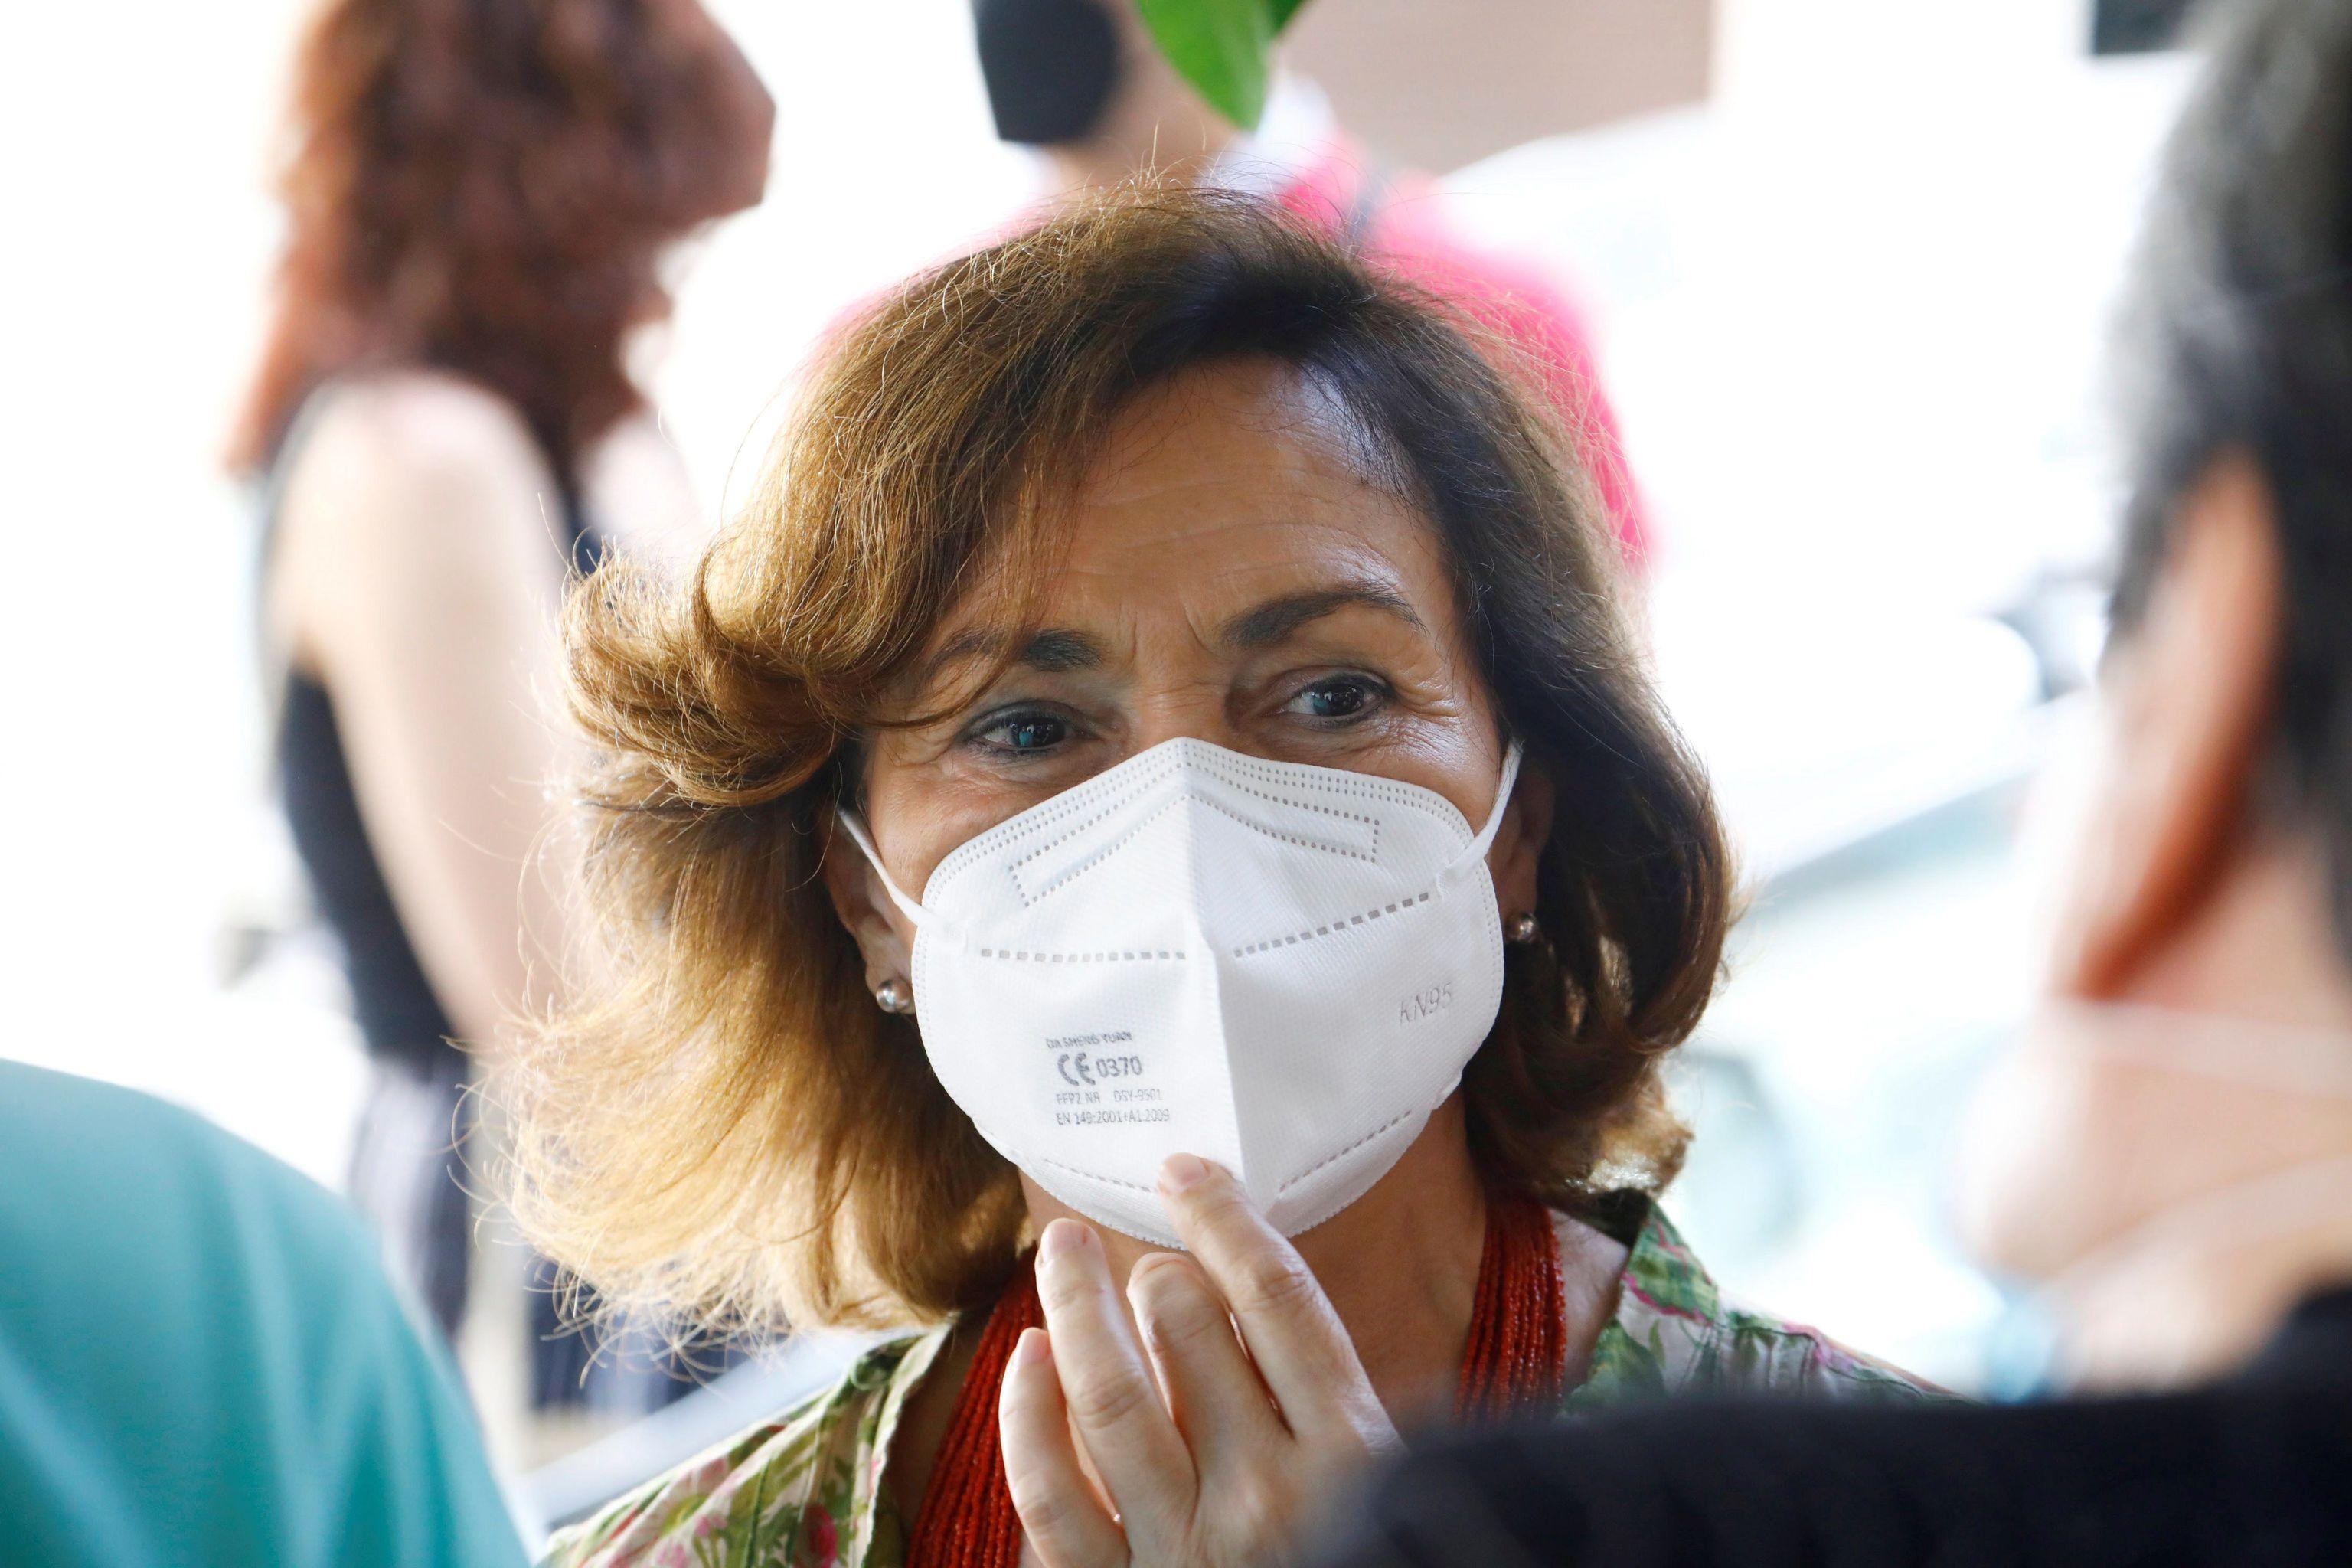 La vicepresidenta del Gobierno, Carmen Calvo, hoy en Córdoba.